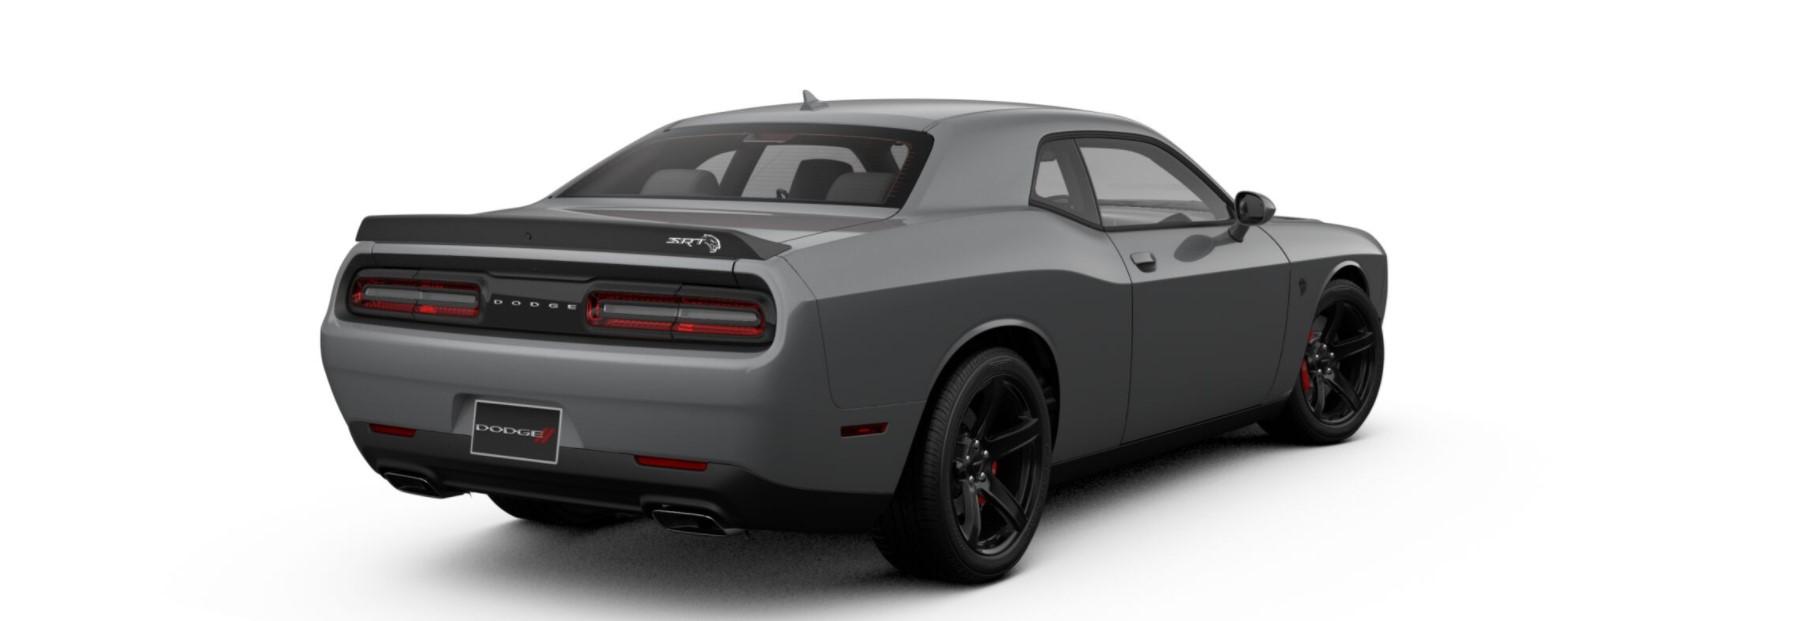 2018 Dodge Charger Srt Hellcat Irvine Auto Center Irvine Ca